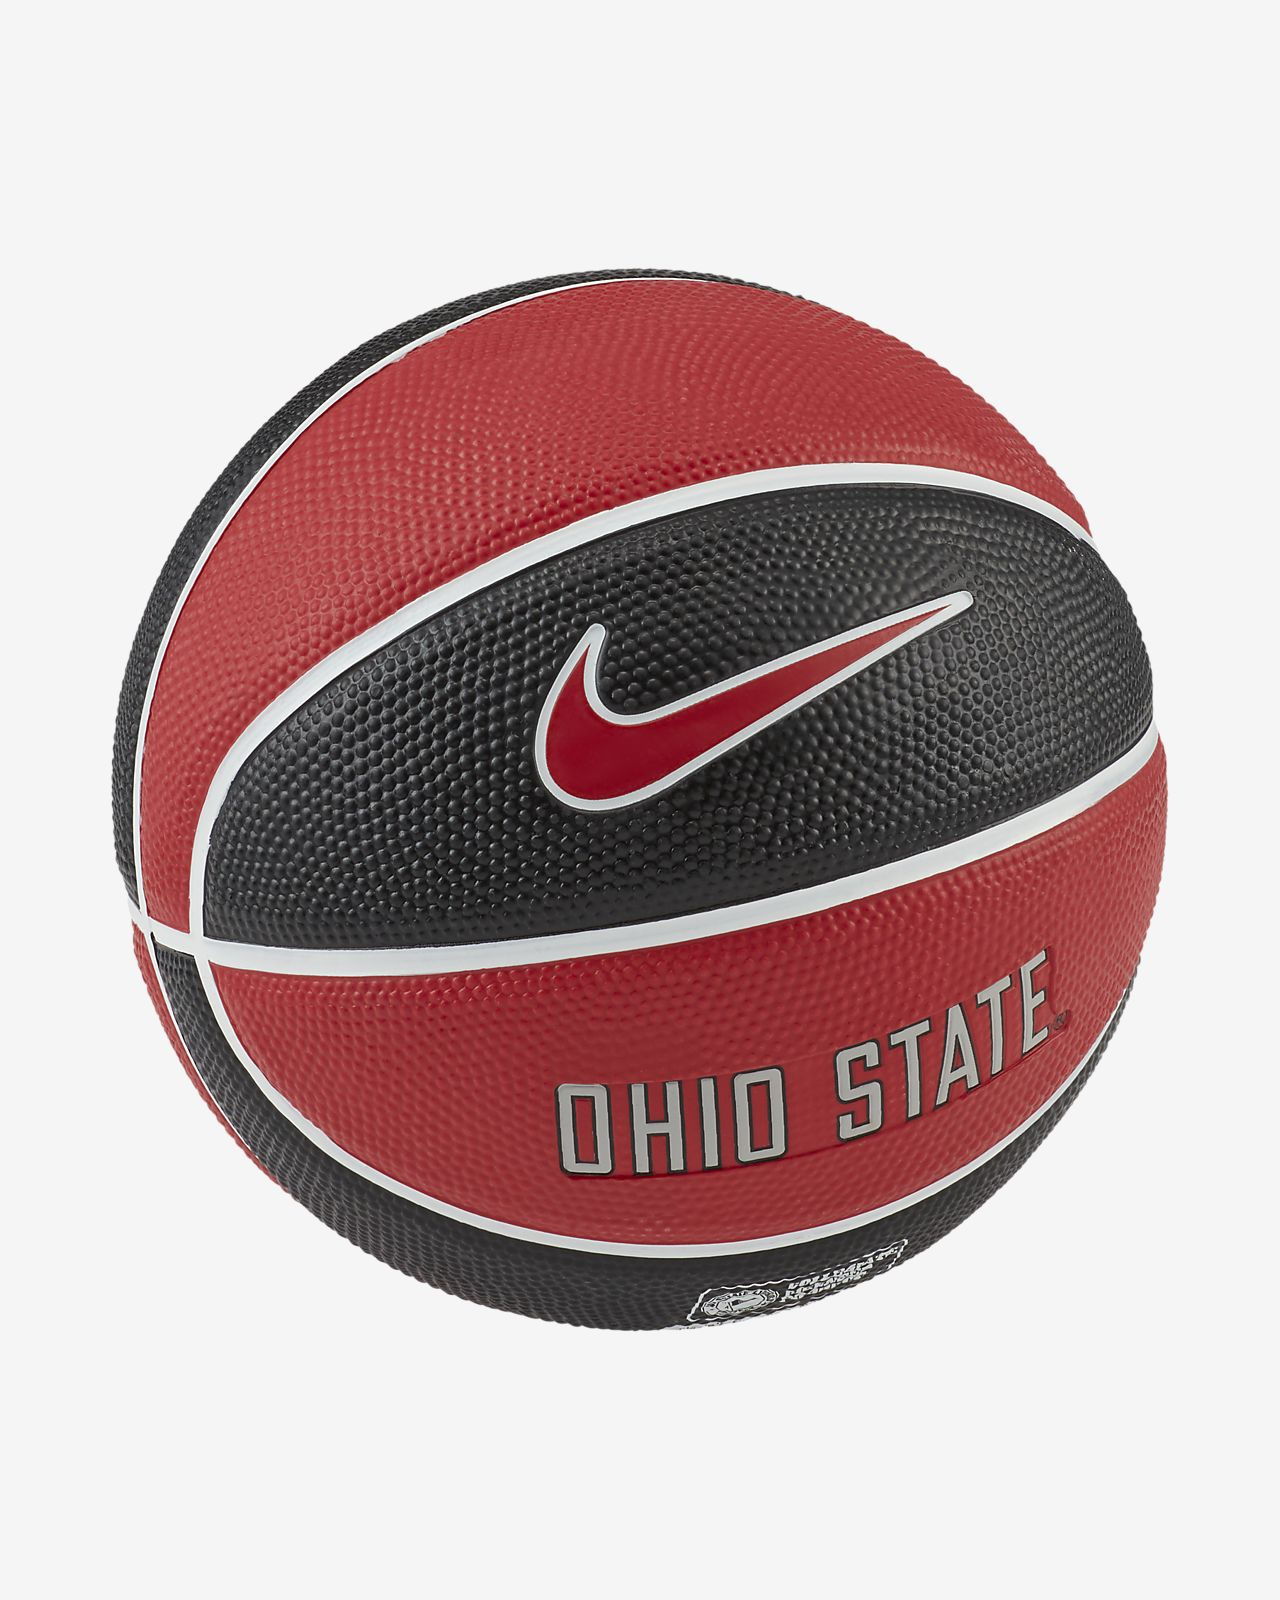 Nike College Mini (Ohio State) Basketball